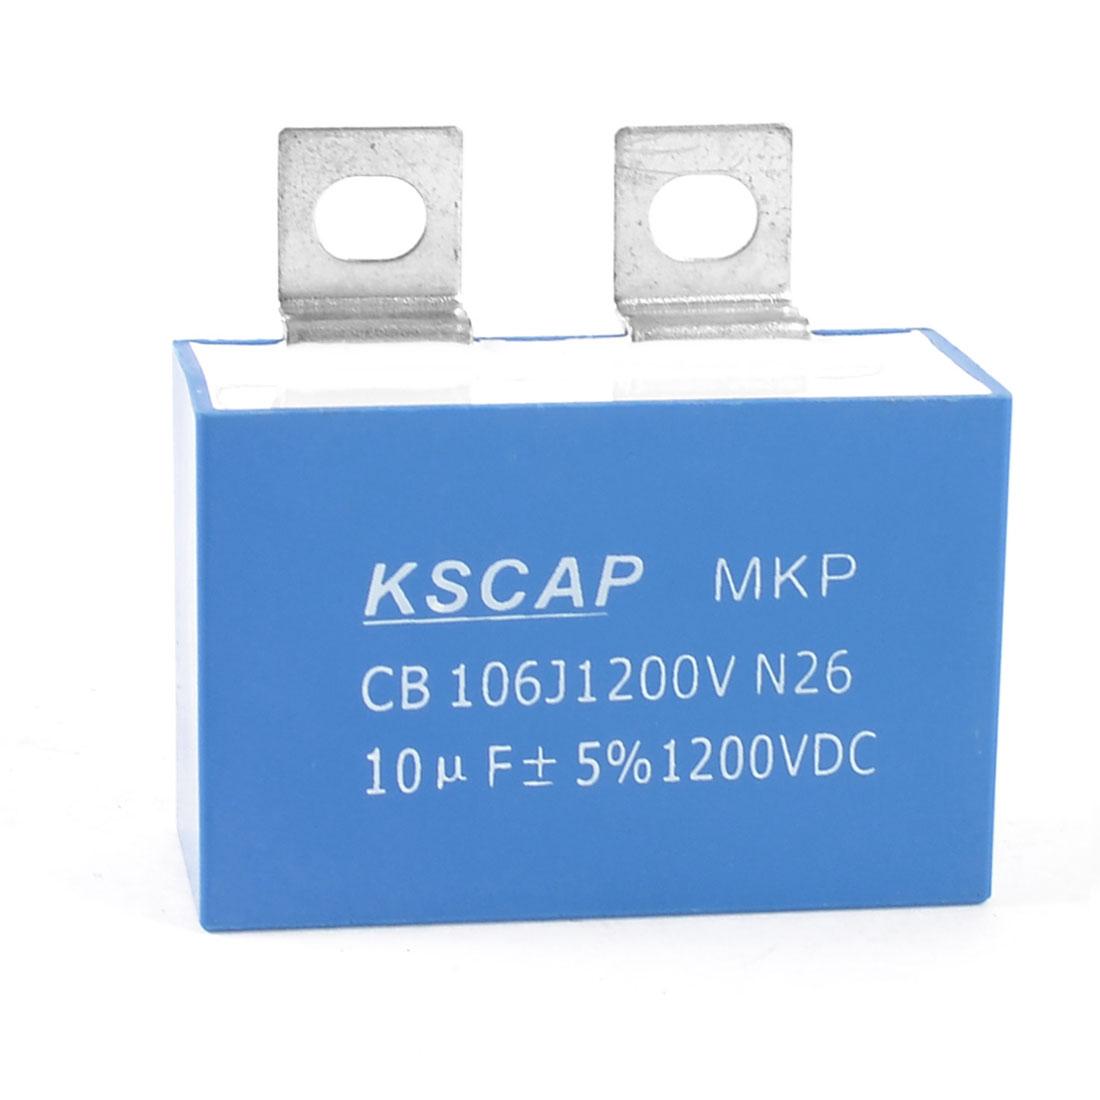 MKP Polypropylene Film Motor Capacitor 1200VDC 10uF